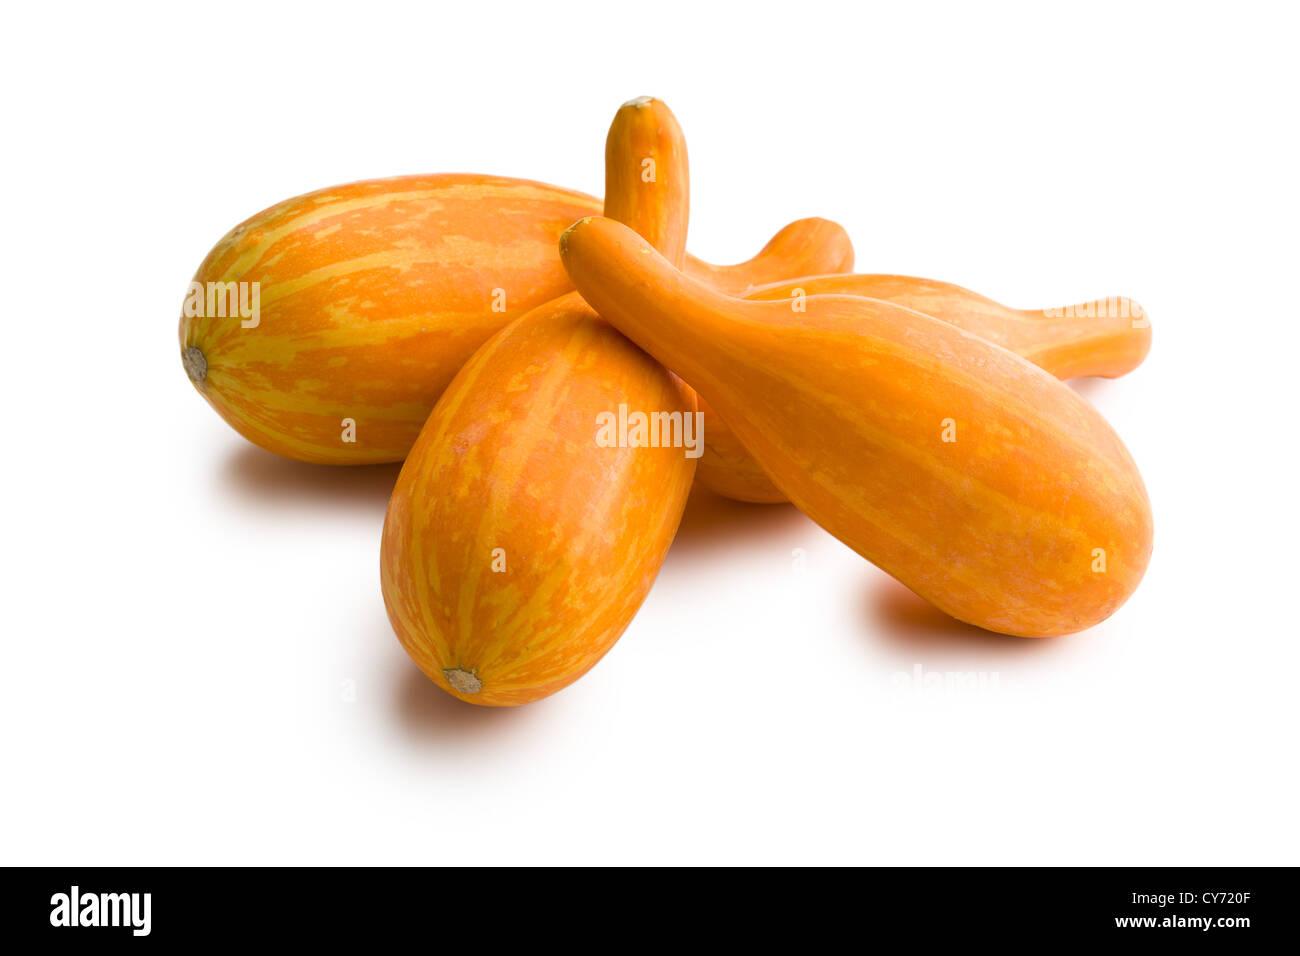 decorative pumpkins on white background - Stock Image